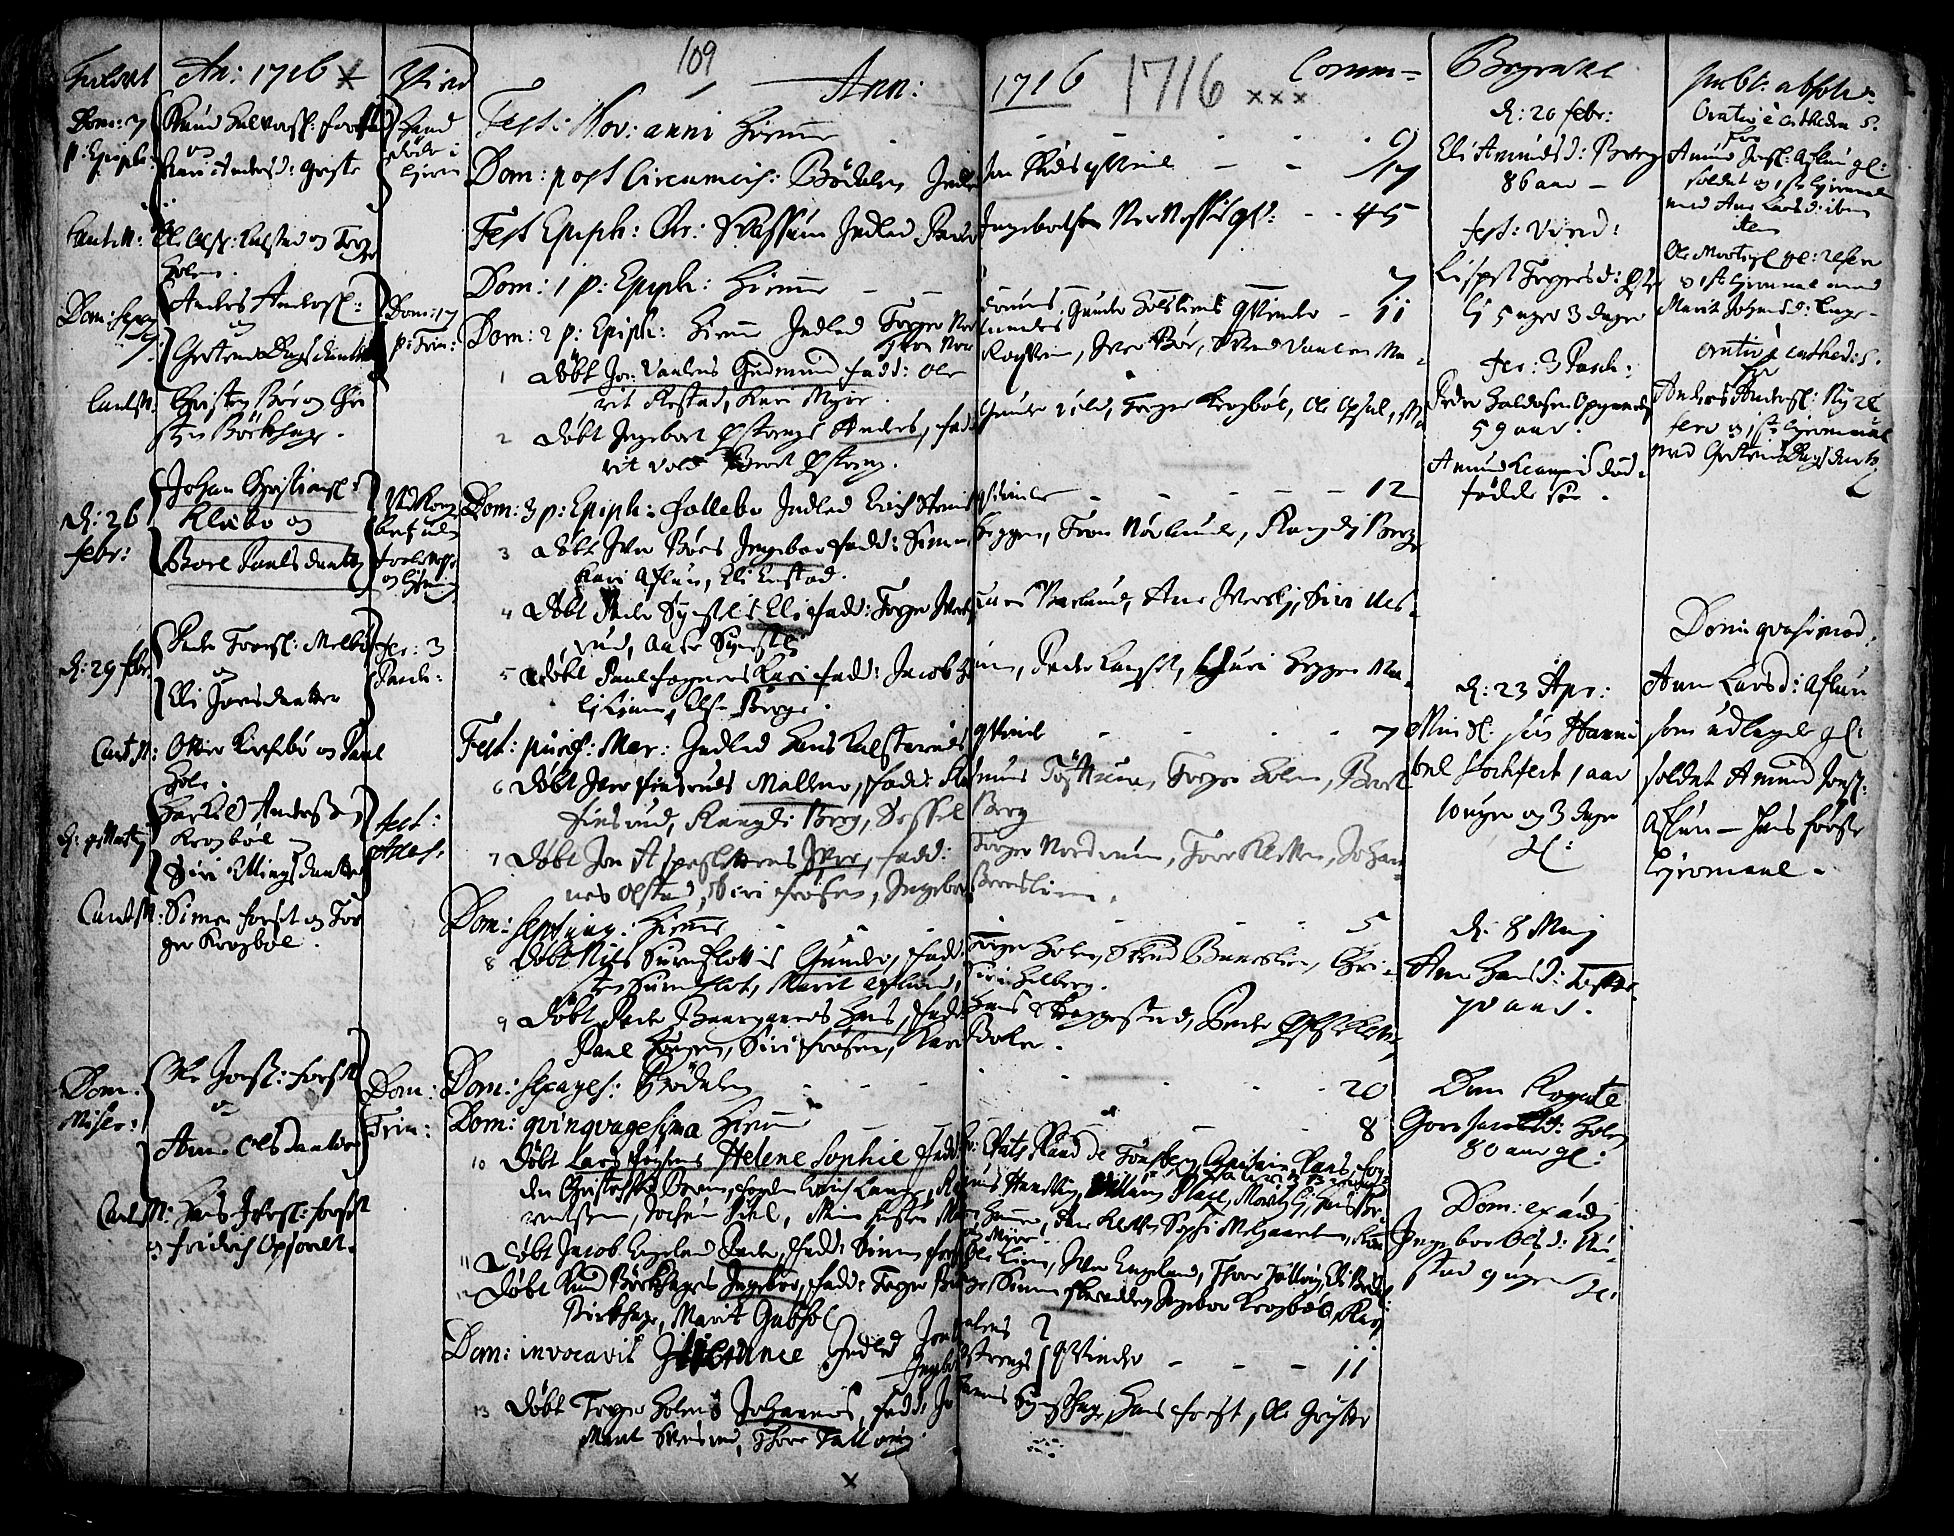 SAH, Gausdal prestekontor, Ministerialbok nr. 1, 1693-1728, s. 109